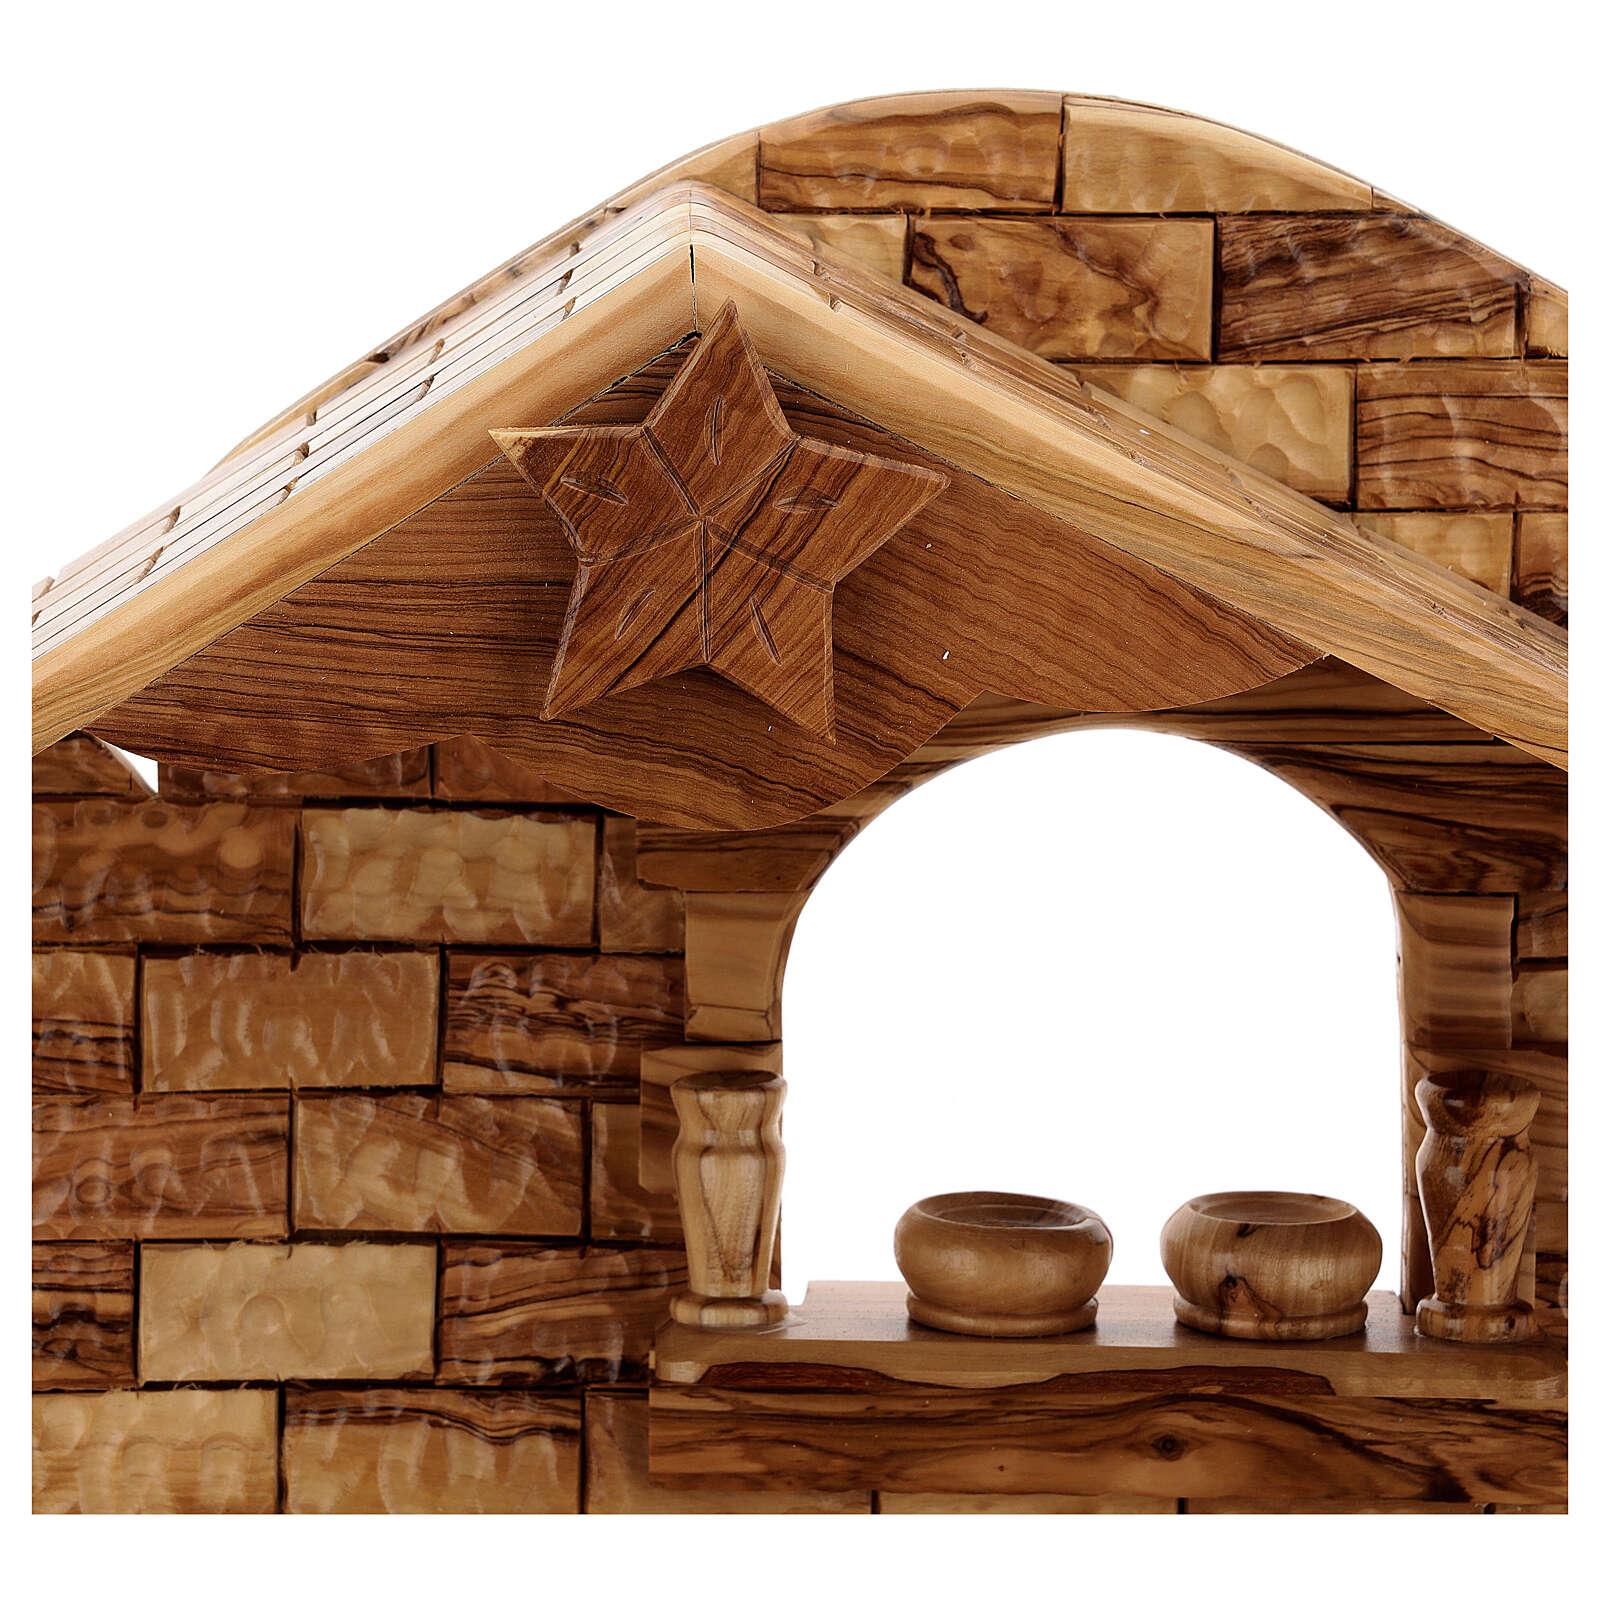 Cabaña Natividad 14 estatuas 20 cm carillón madera olivo Palestina 45x65x35 cm 4